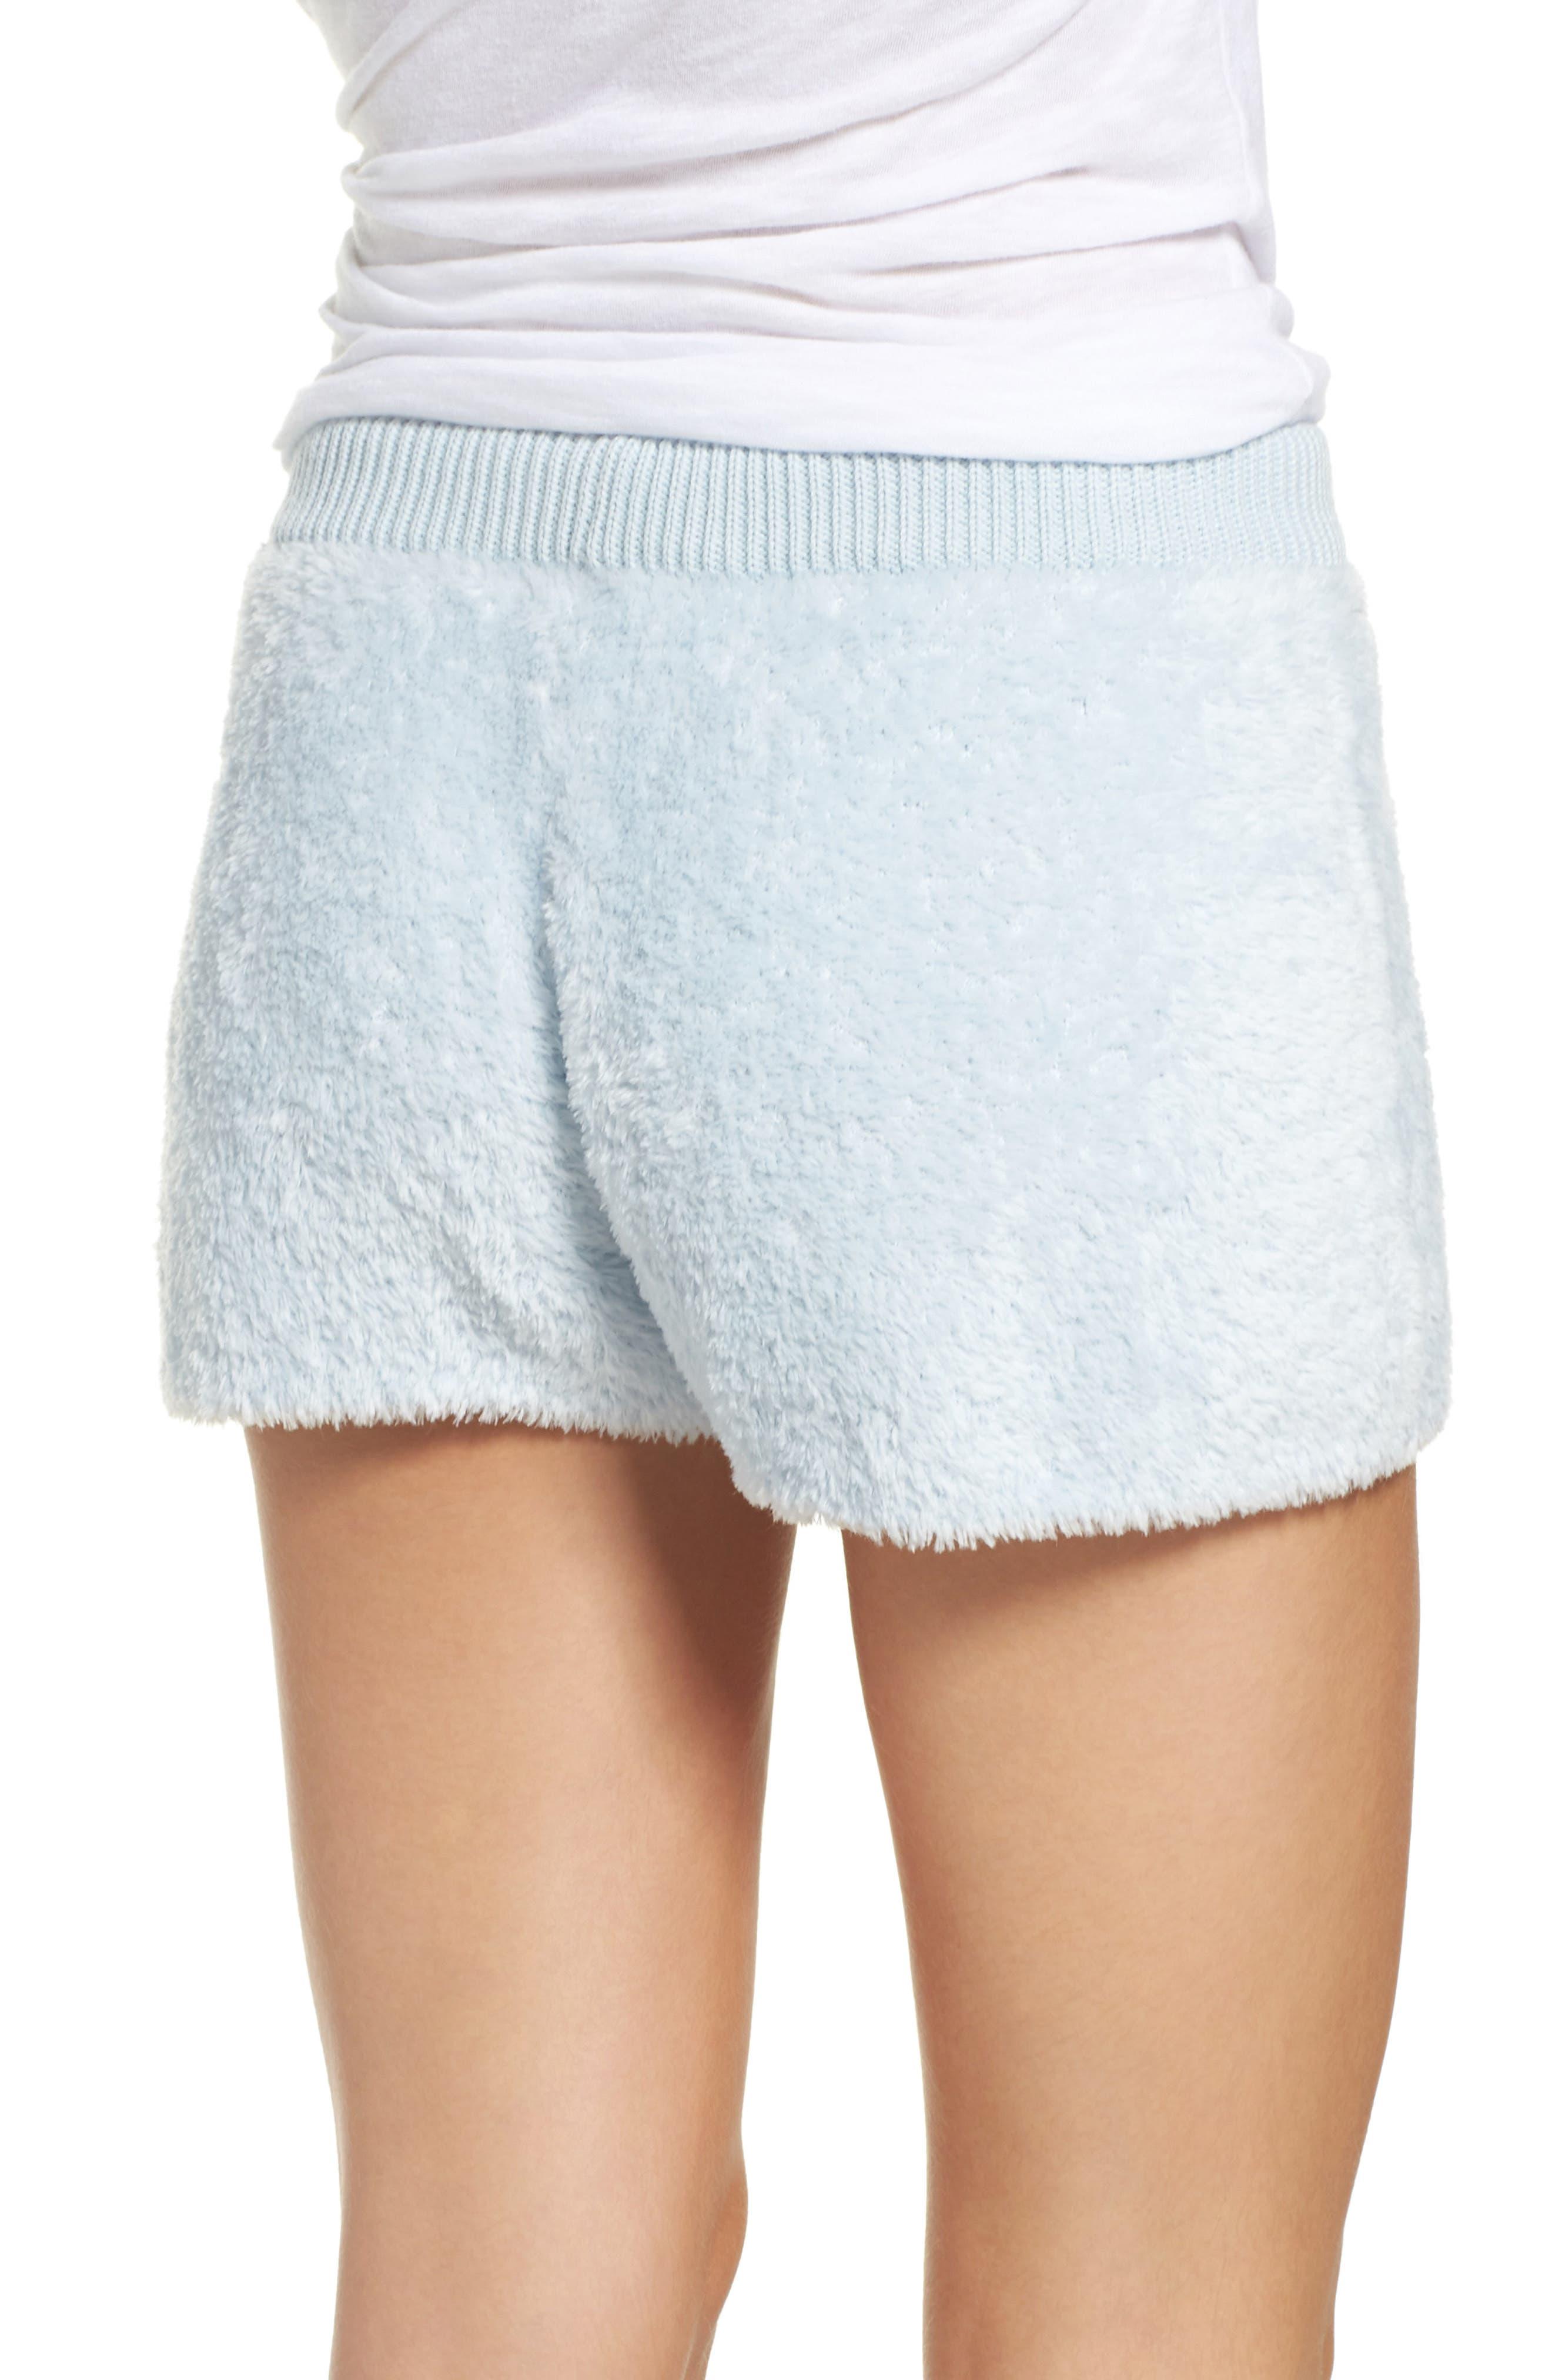 Fuzzy Lounge Shorts,                             Alternate thumbnail 8, color,